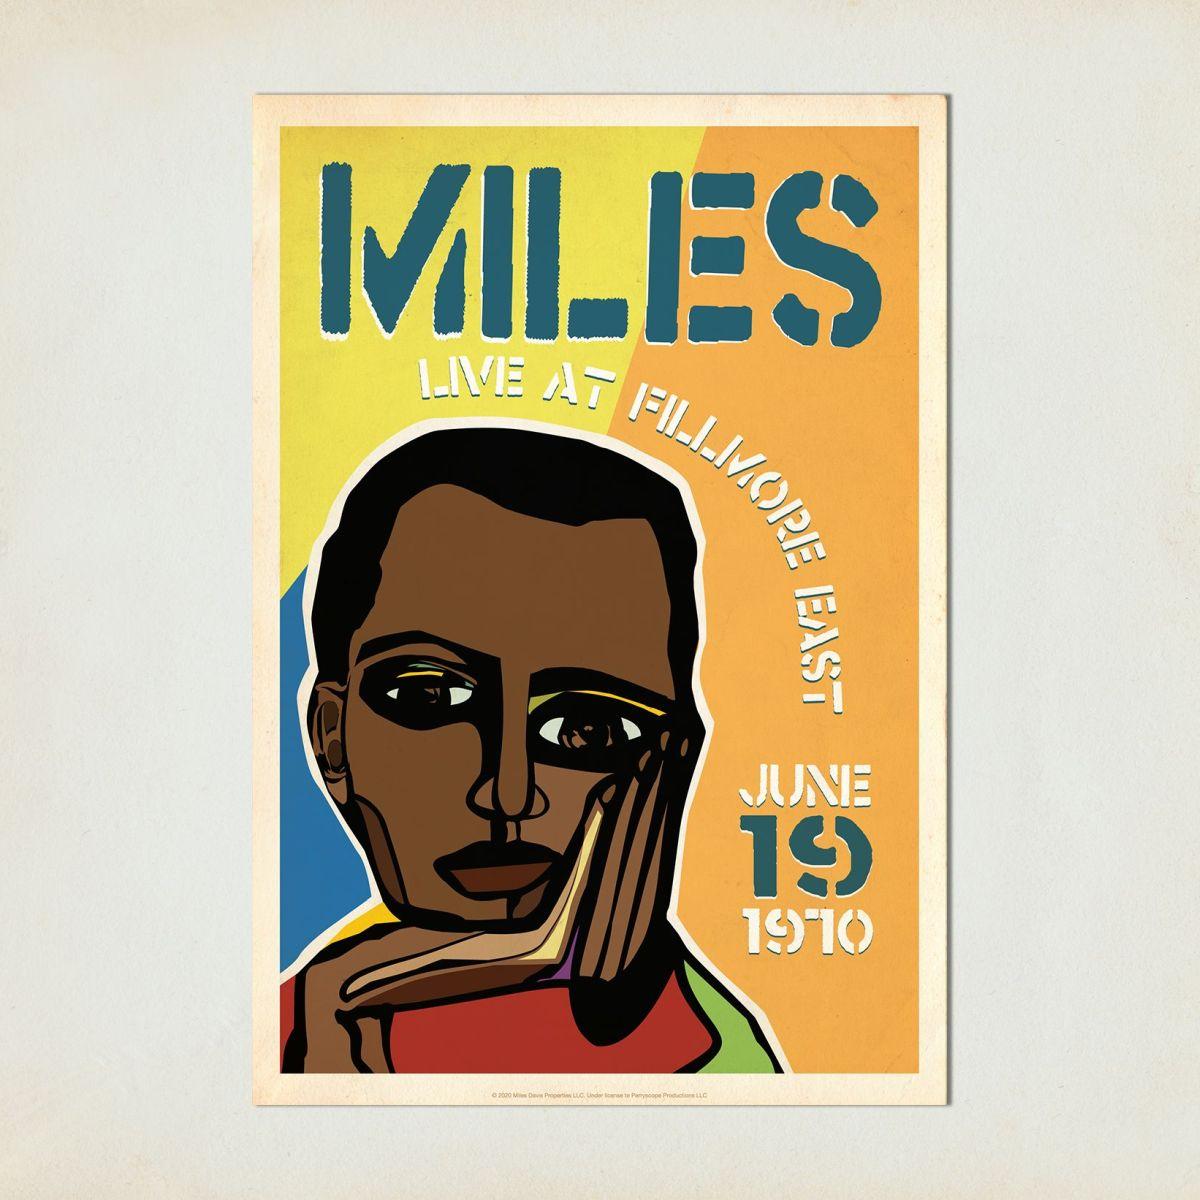 Miles Live at the Fillmore East, Cubism Concert Print